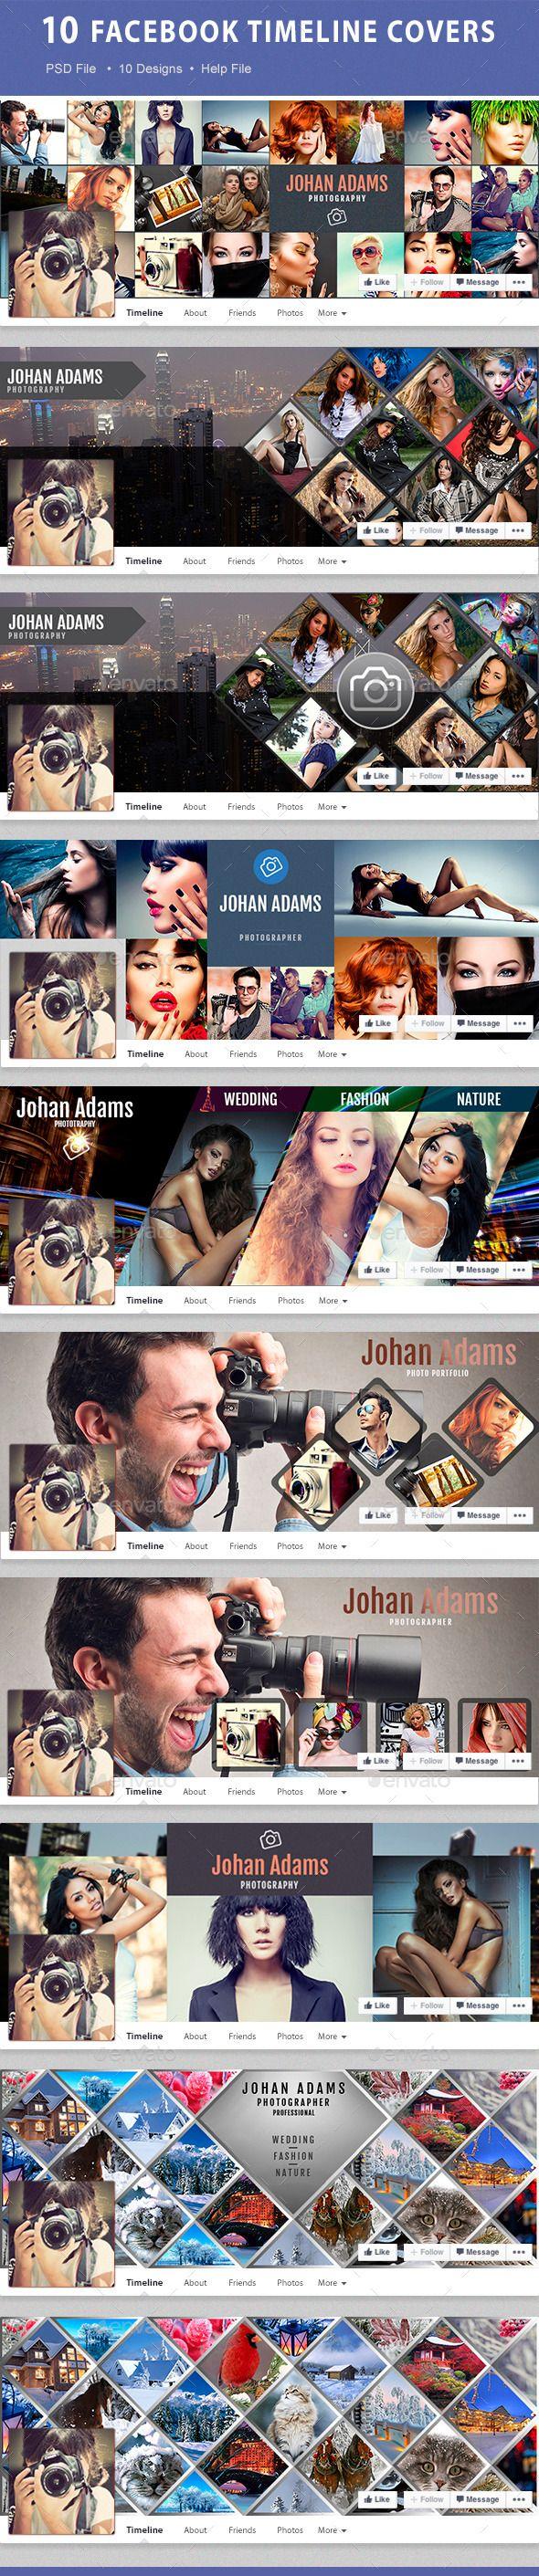 10 Facebook Timeline Covers Template PSD #design